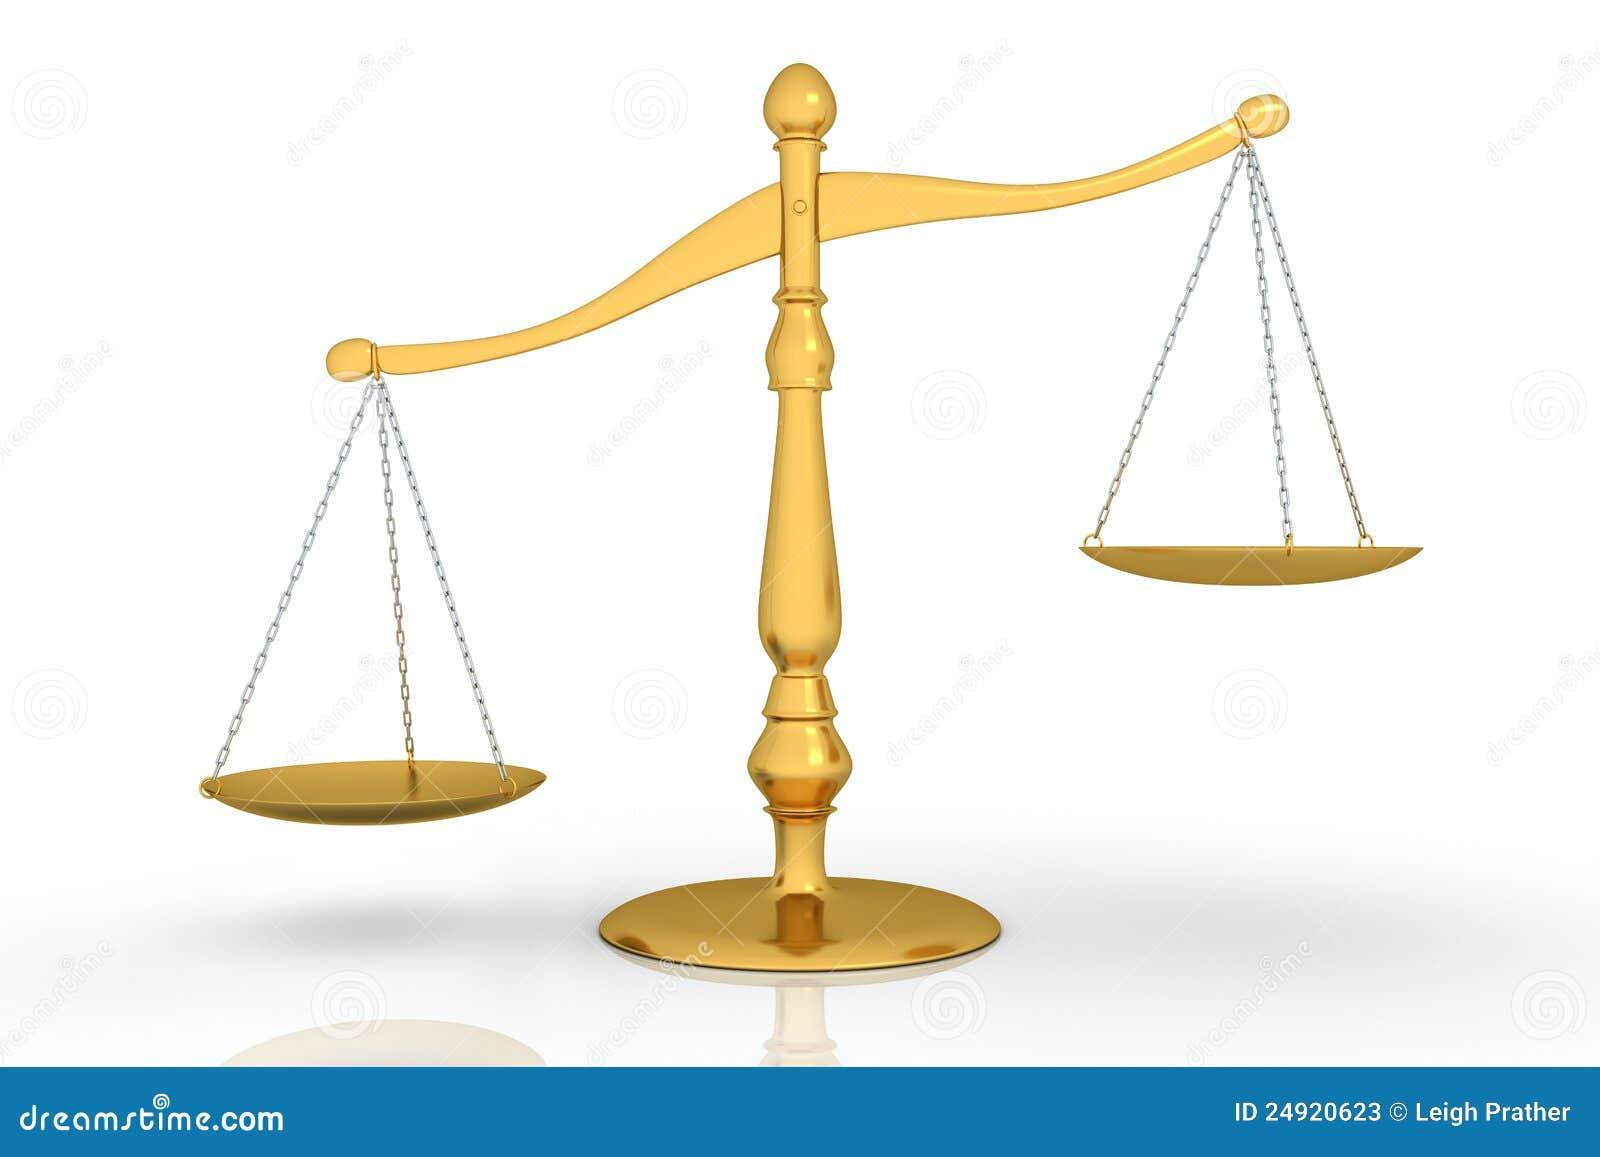 Uneven Scale Of Justice Golden uneven scale - 3d